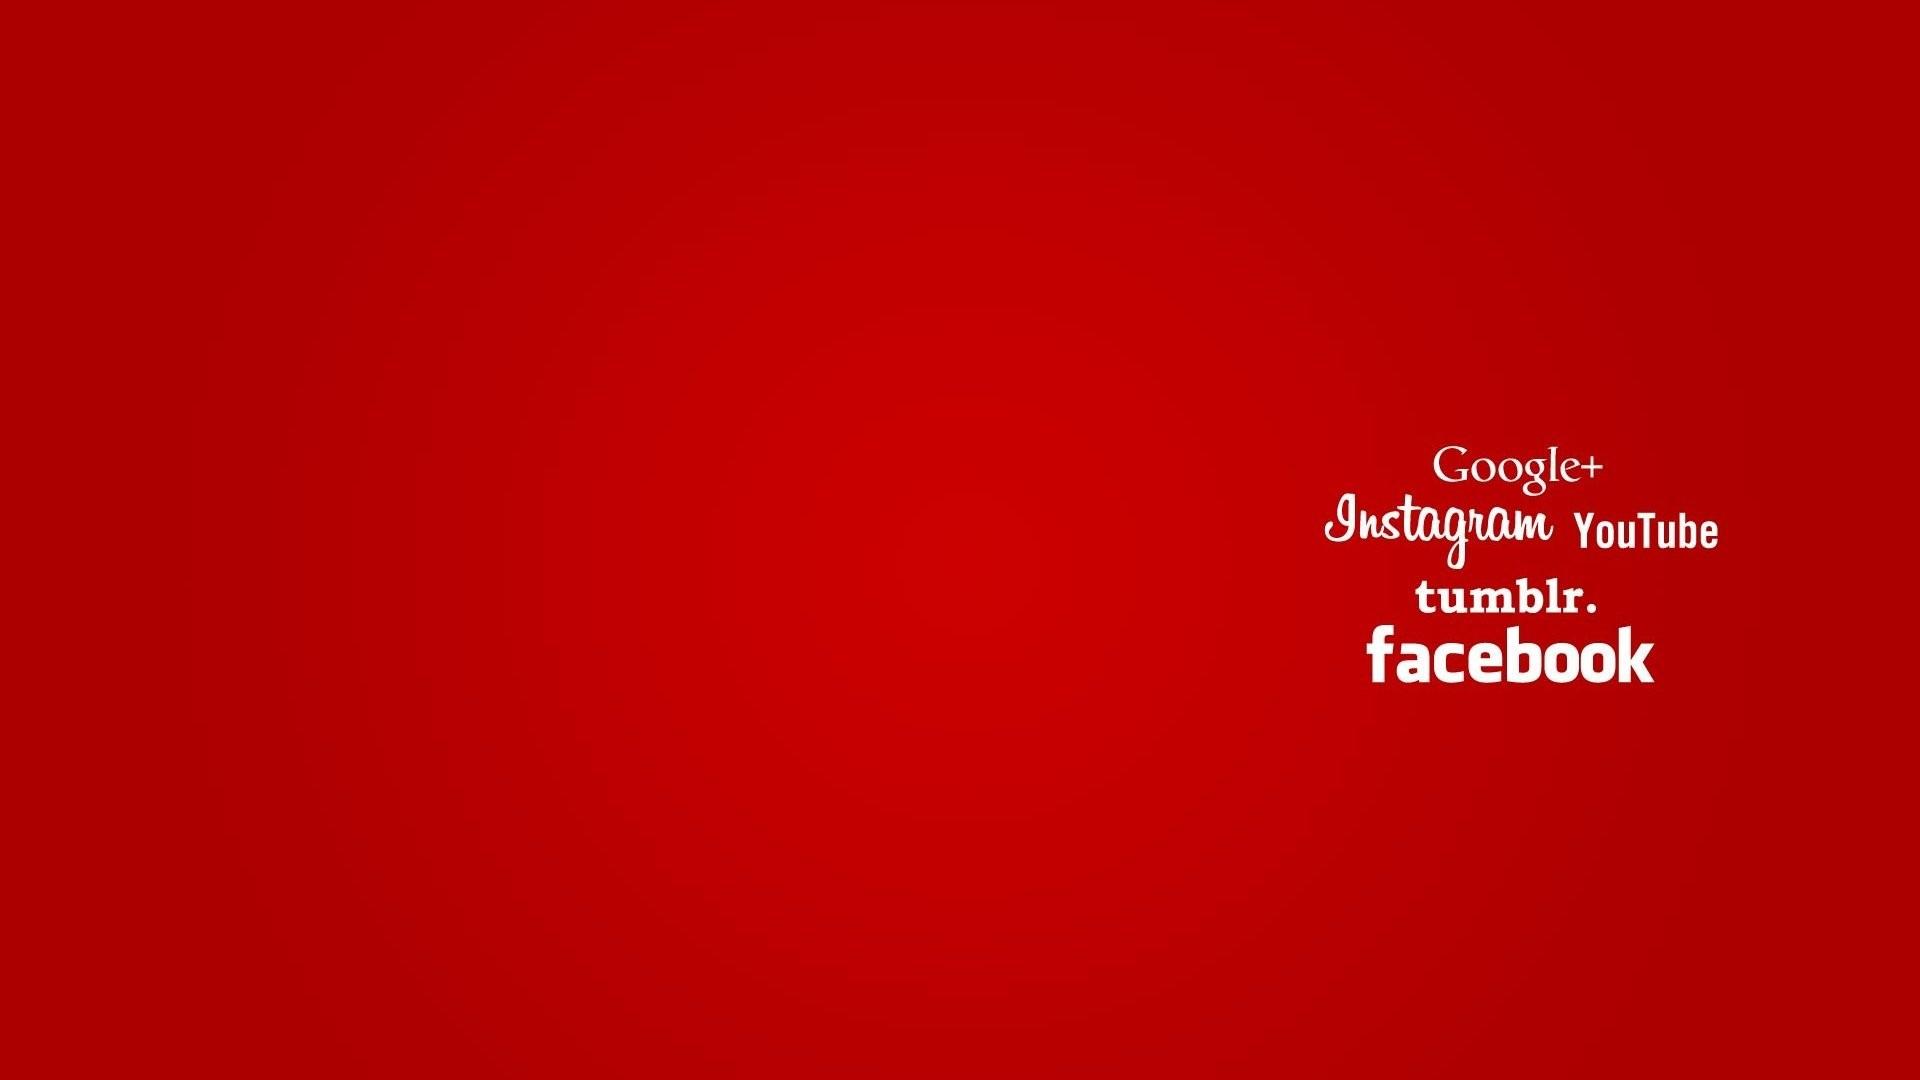 wallpaper: Google+, instagram, YouTube, tumblr, facebook, …